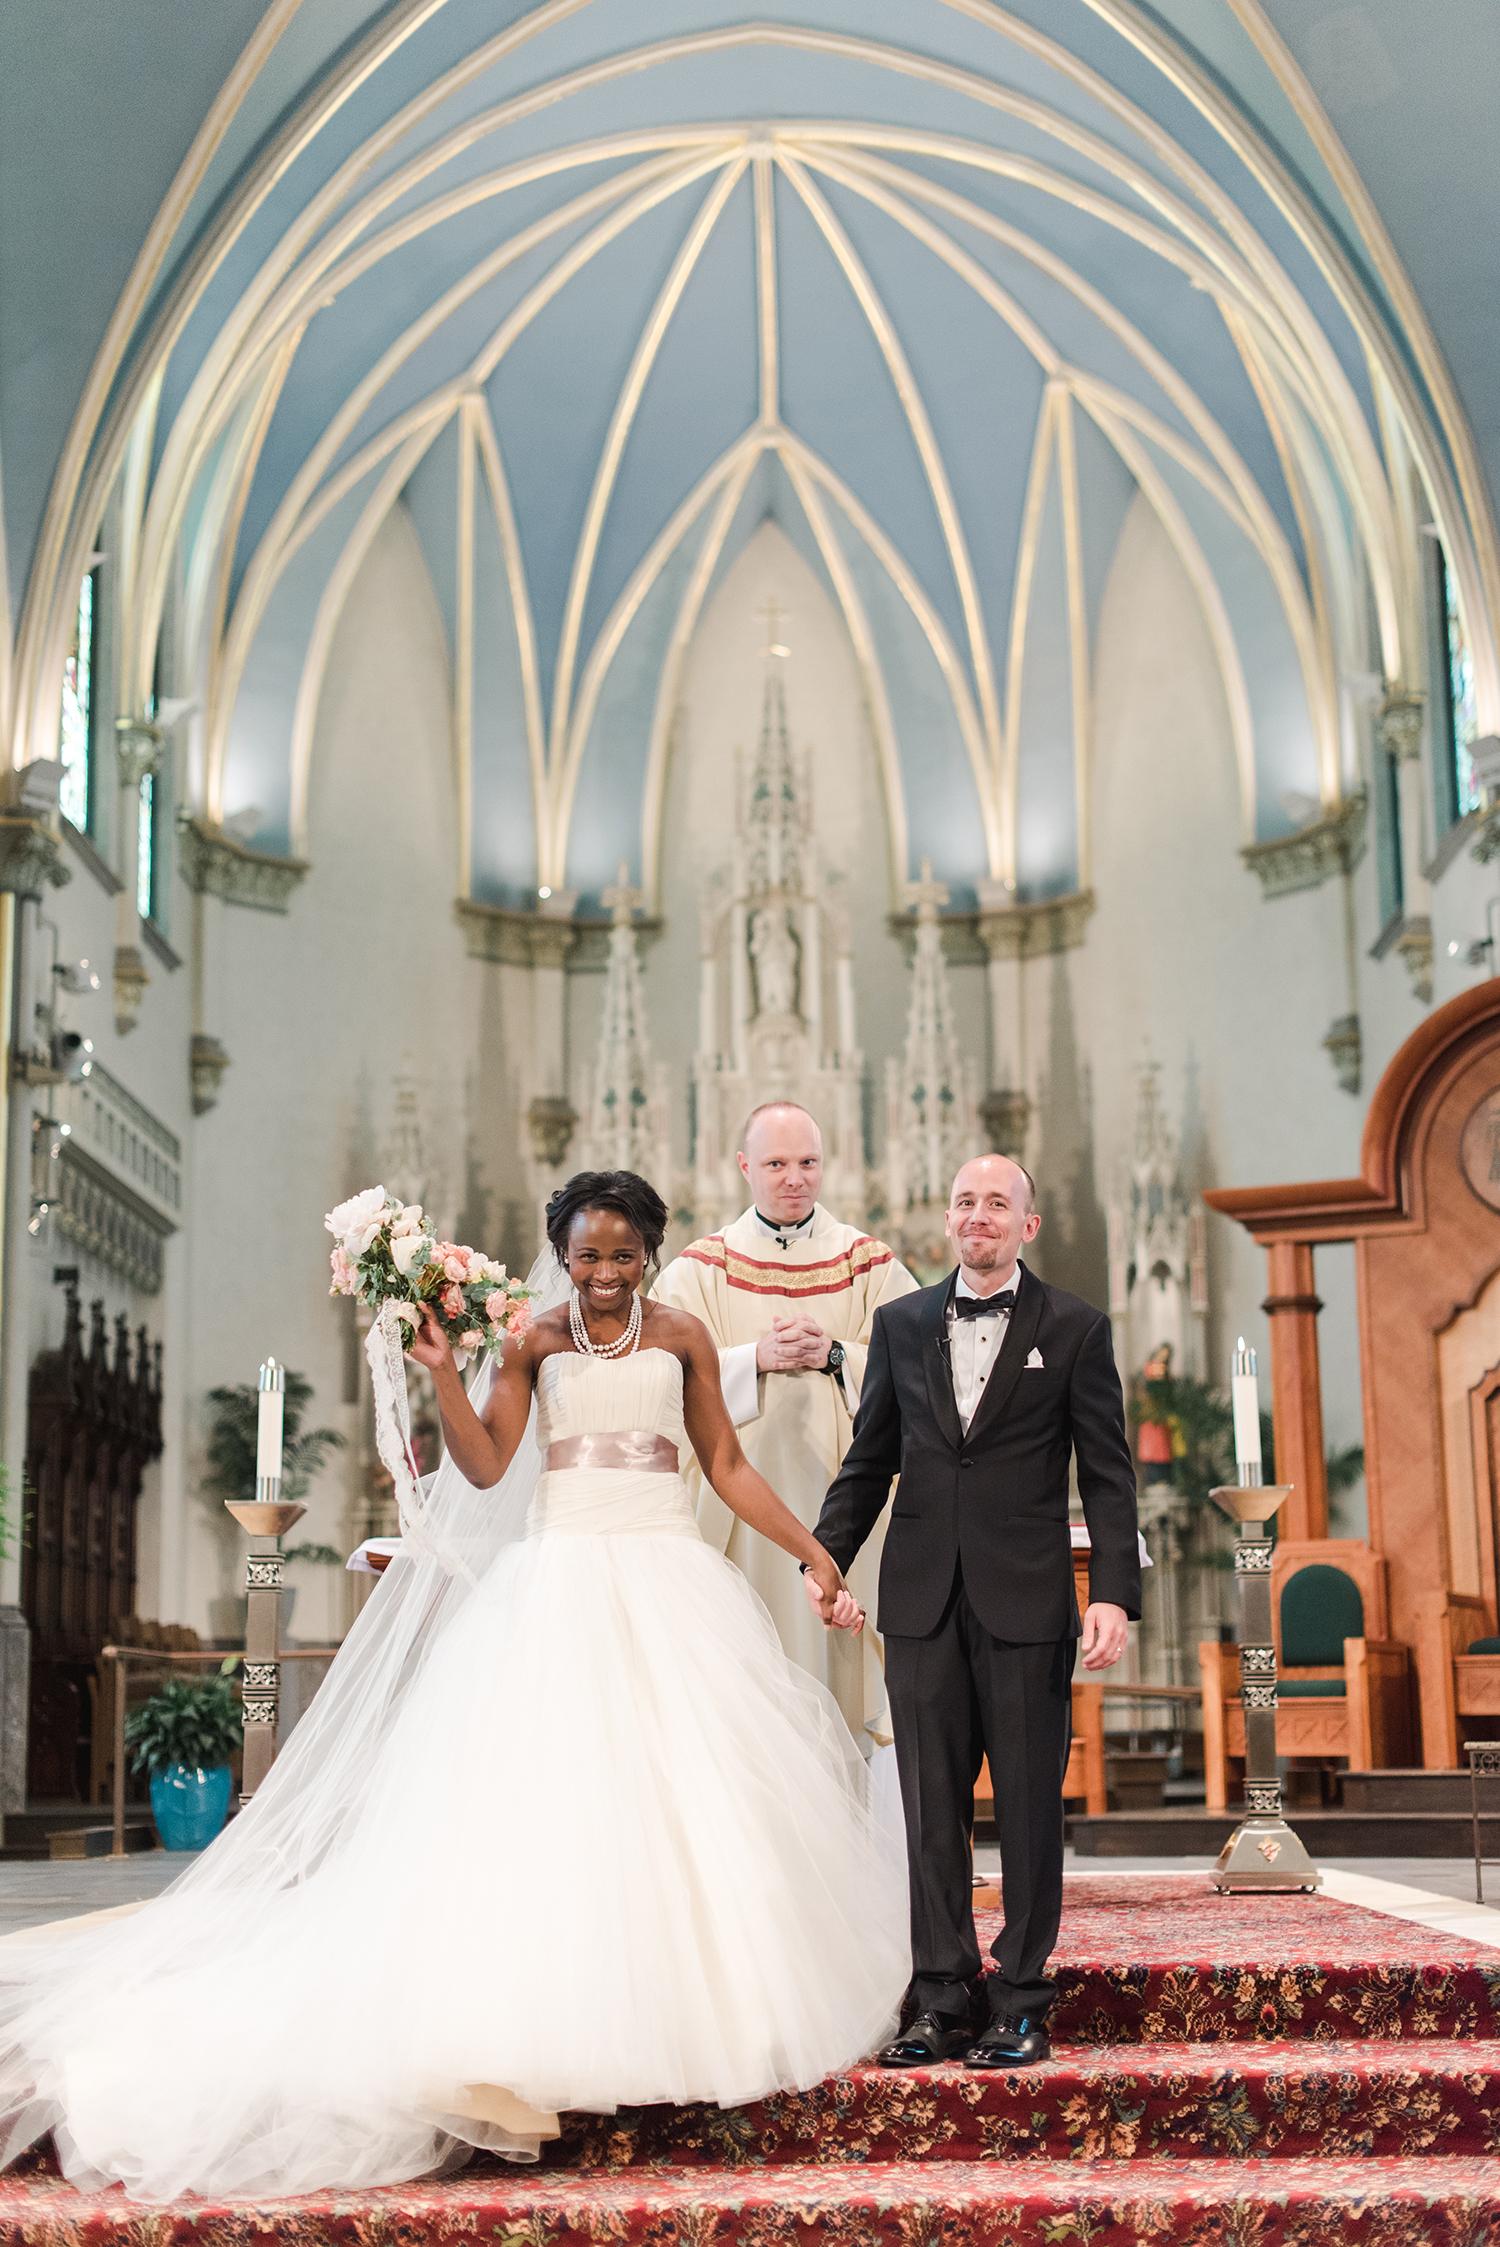 anwuli patrick wedding church ceremony bride and groom